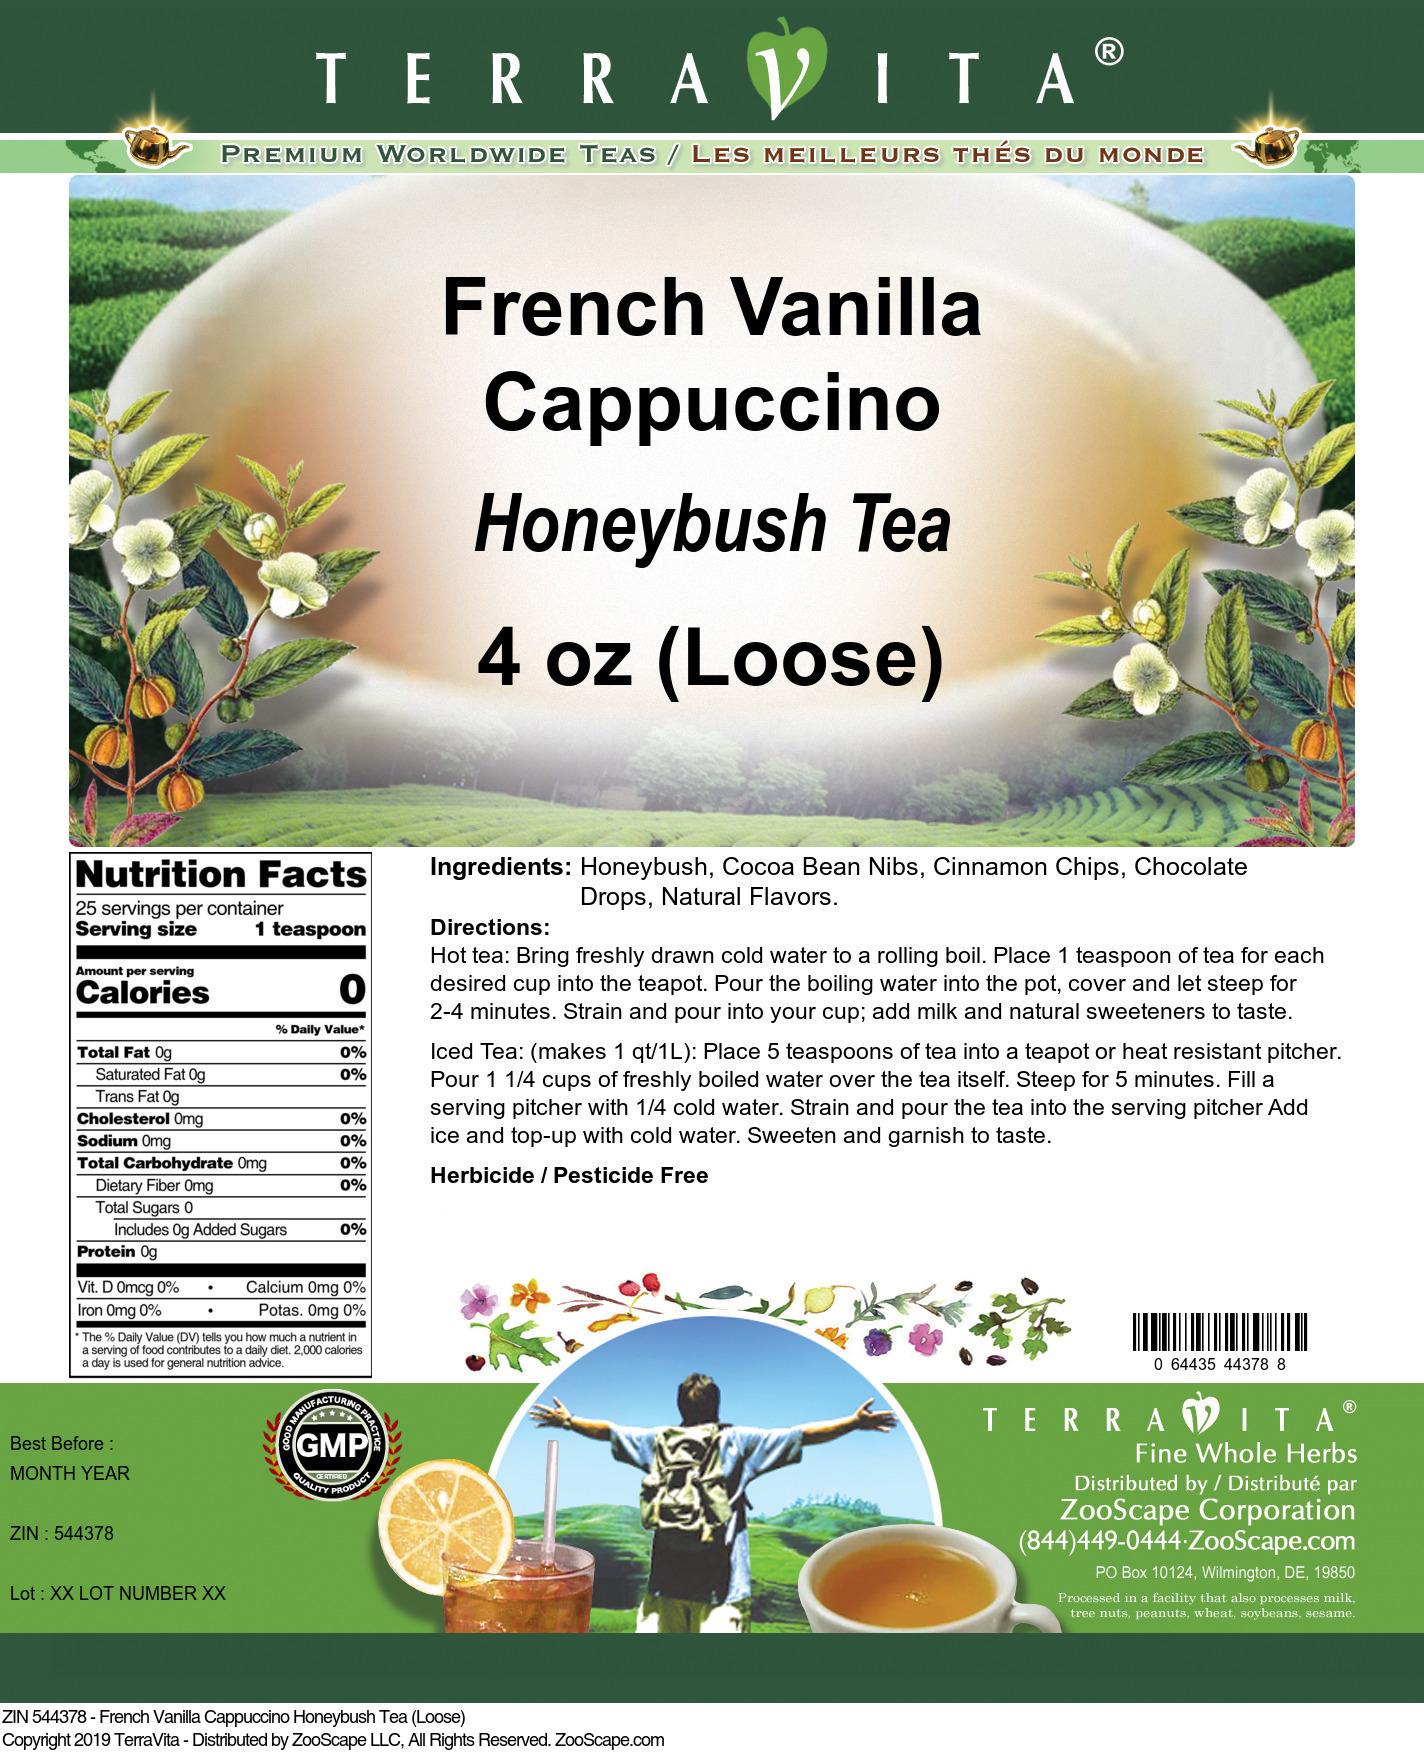 French Vanilla Cappuccino Honeybush Tea